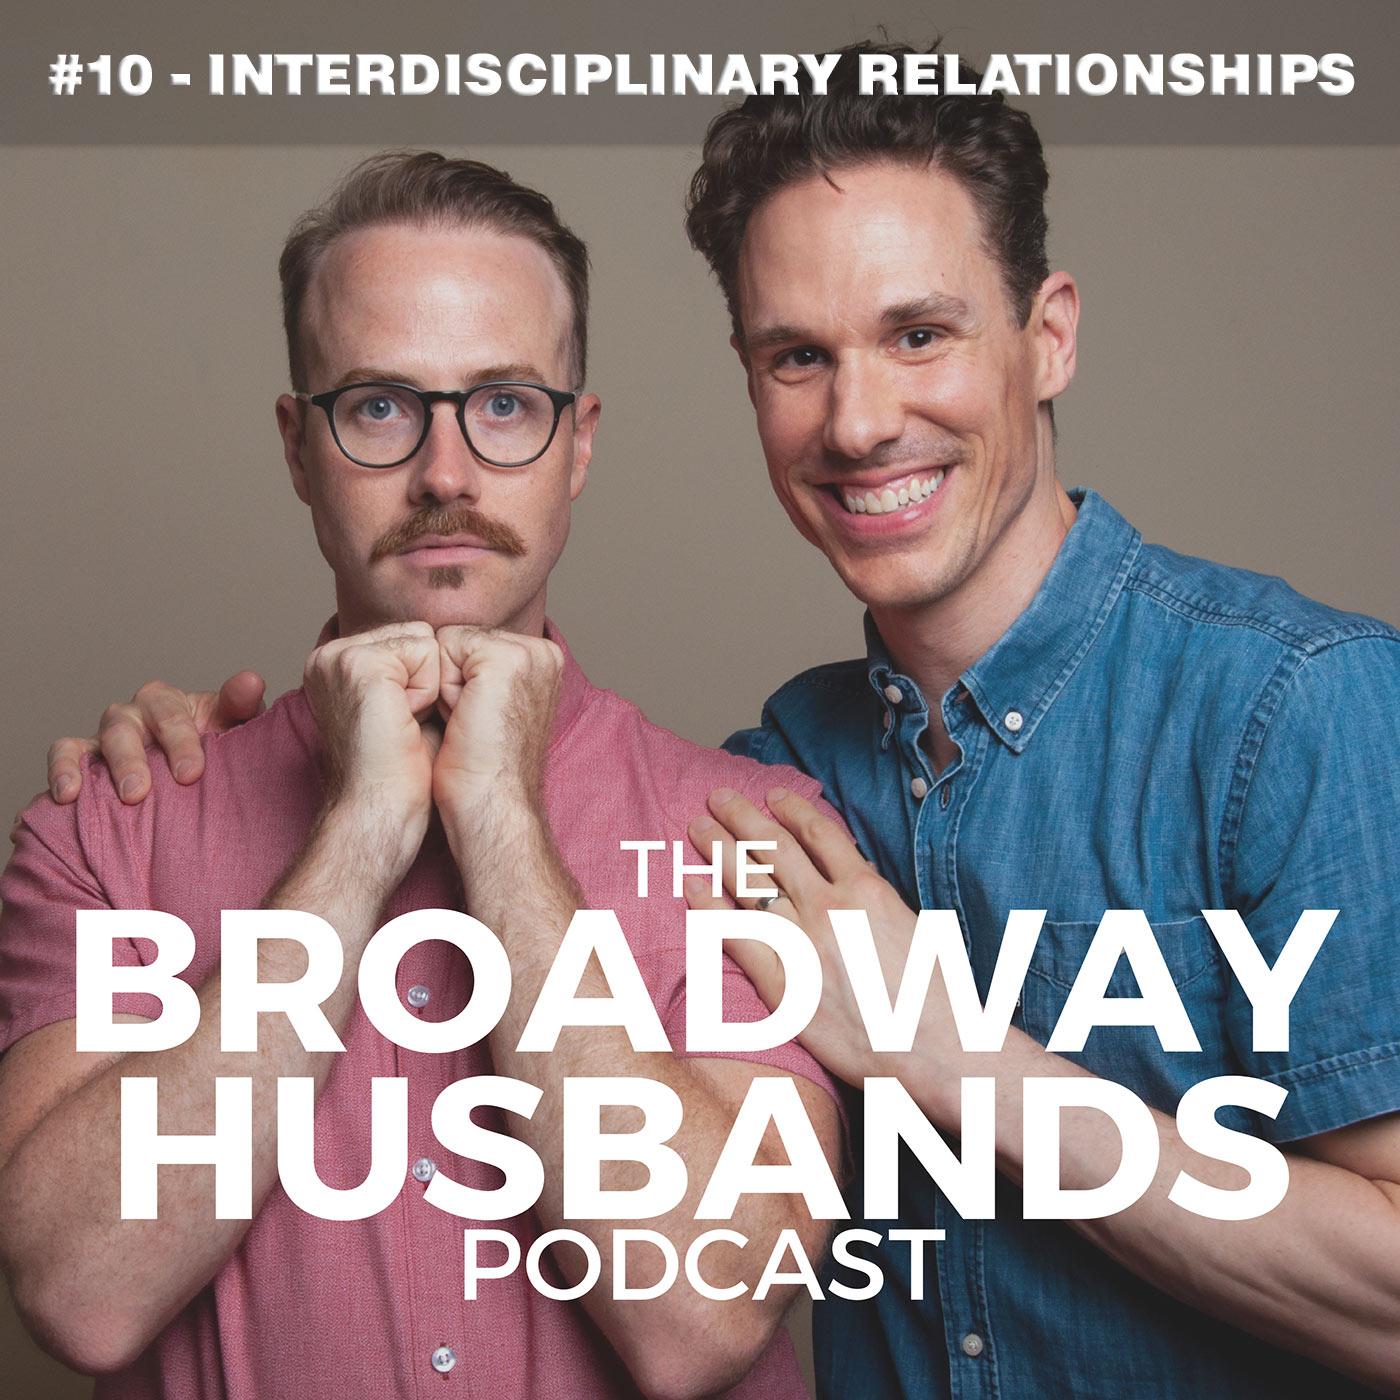 Broadway Husbands Episode 10 Interdisciplinary Relationship